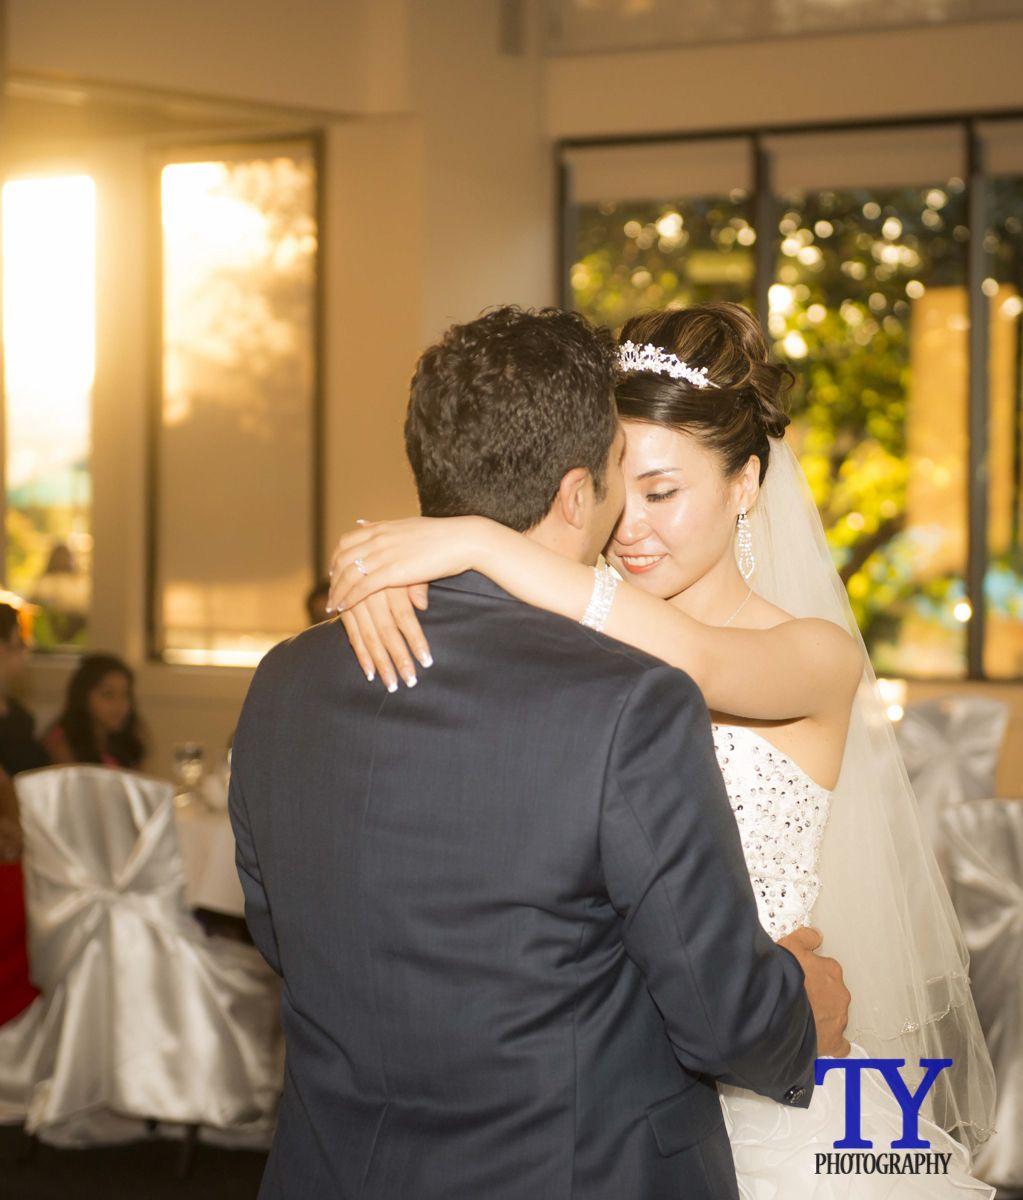 Wedding Gowns Calgary: Calgary Wedding Photographers / Calgary Photographer